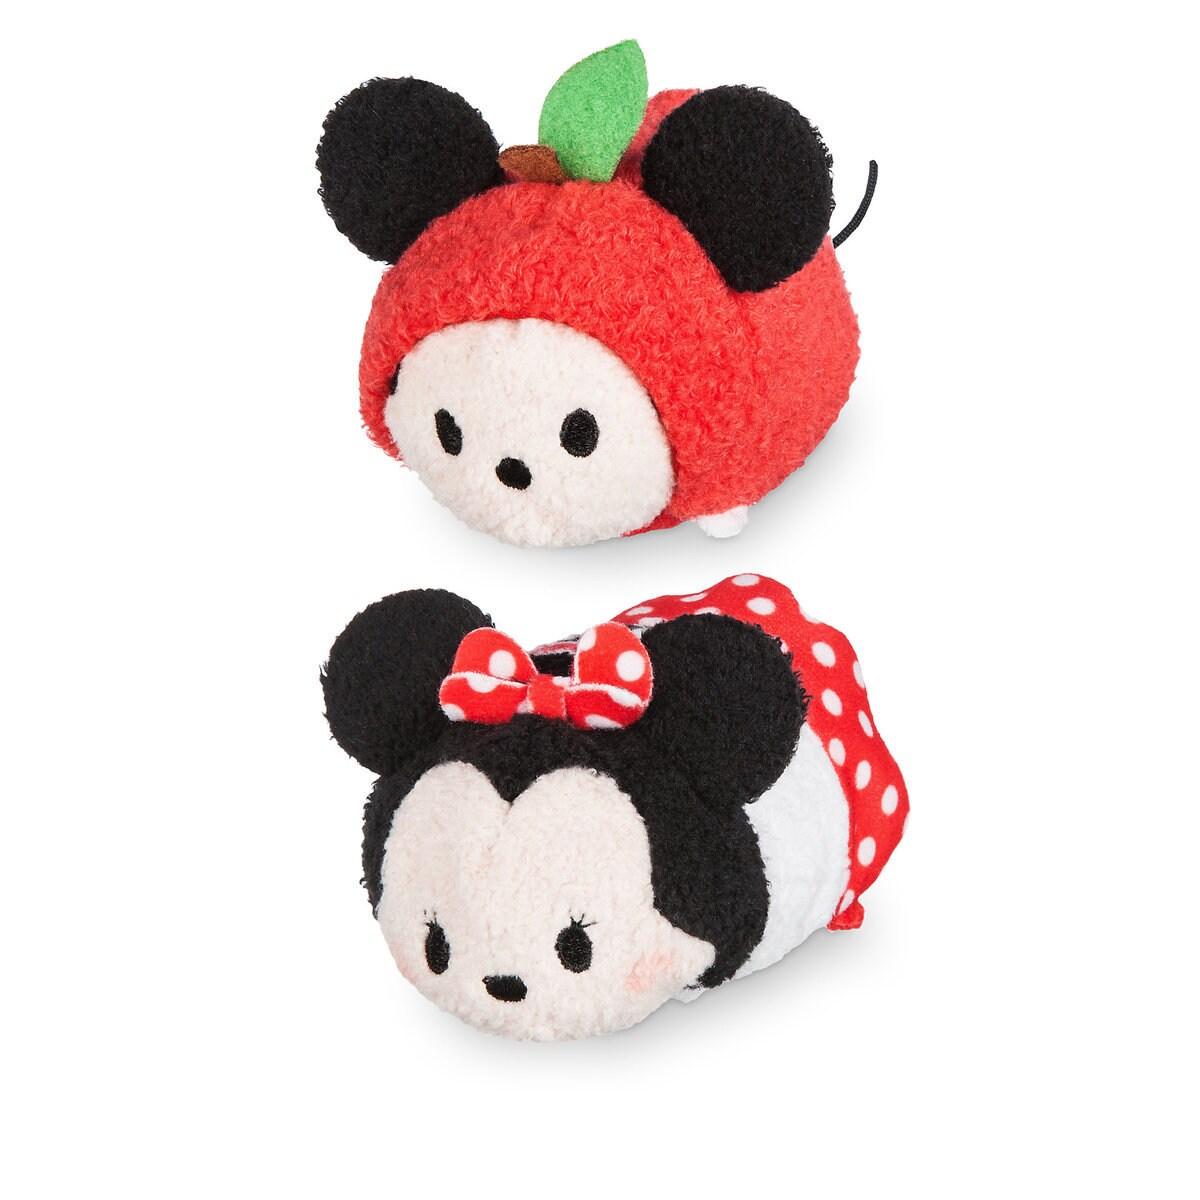 Mickey And Minnie Mouse Tsum Tsum Plush New York Set Mini 3 1